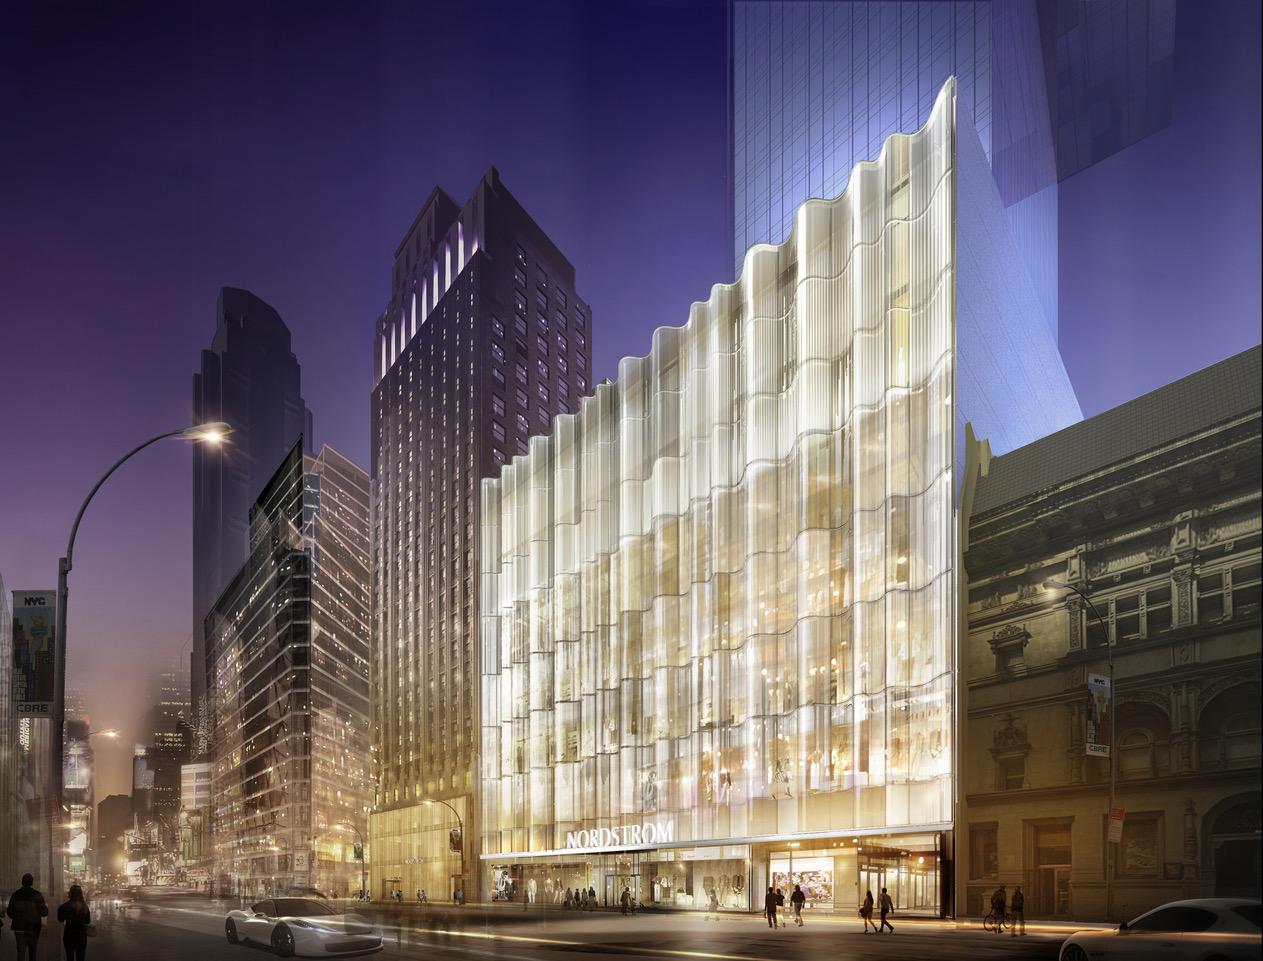 Nordstrom Midtown store (rendering)